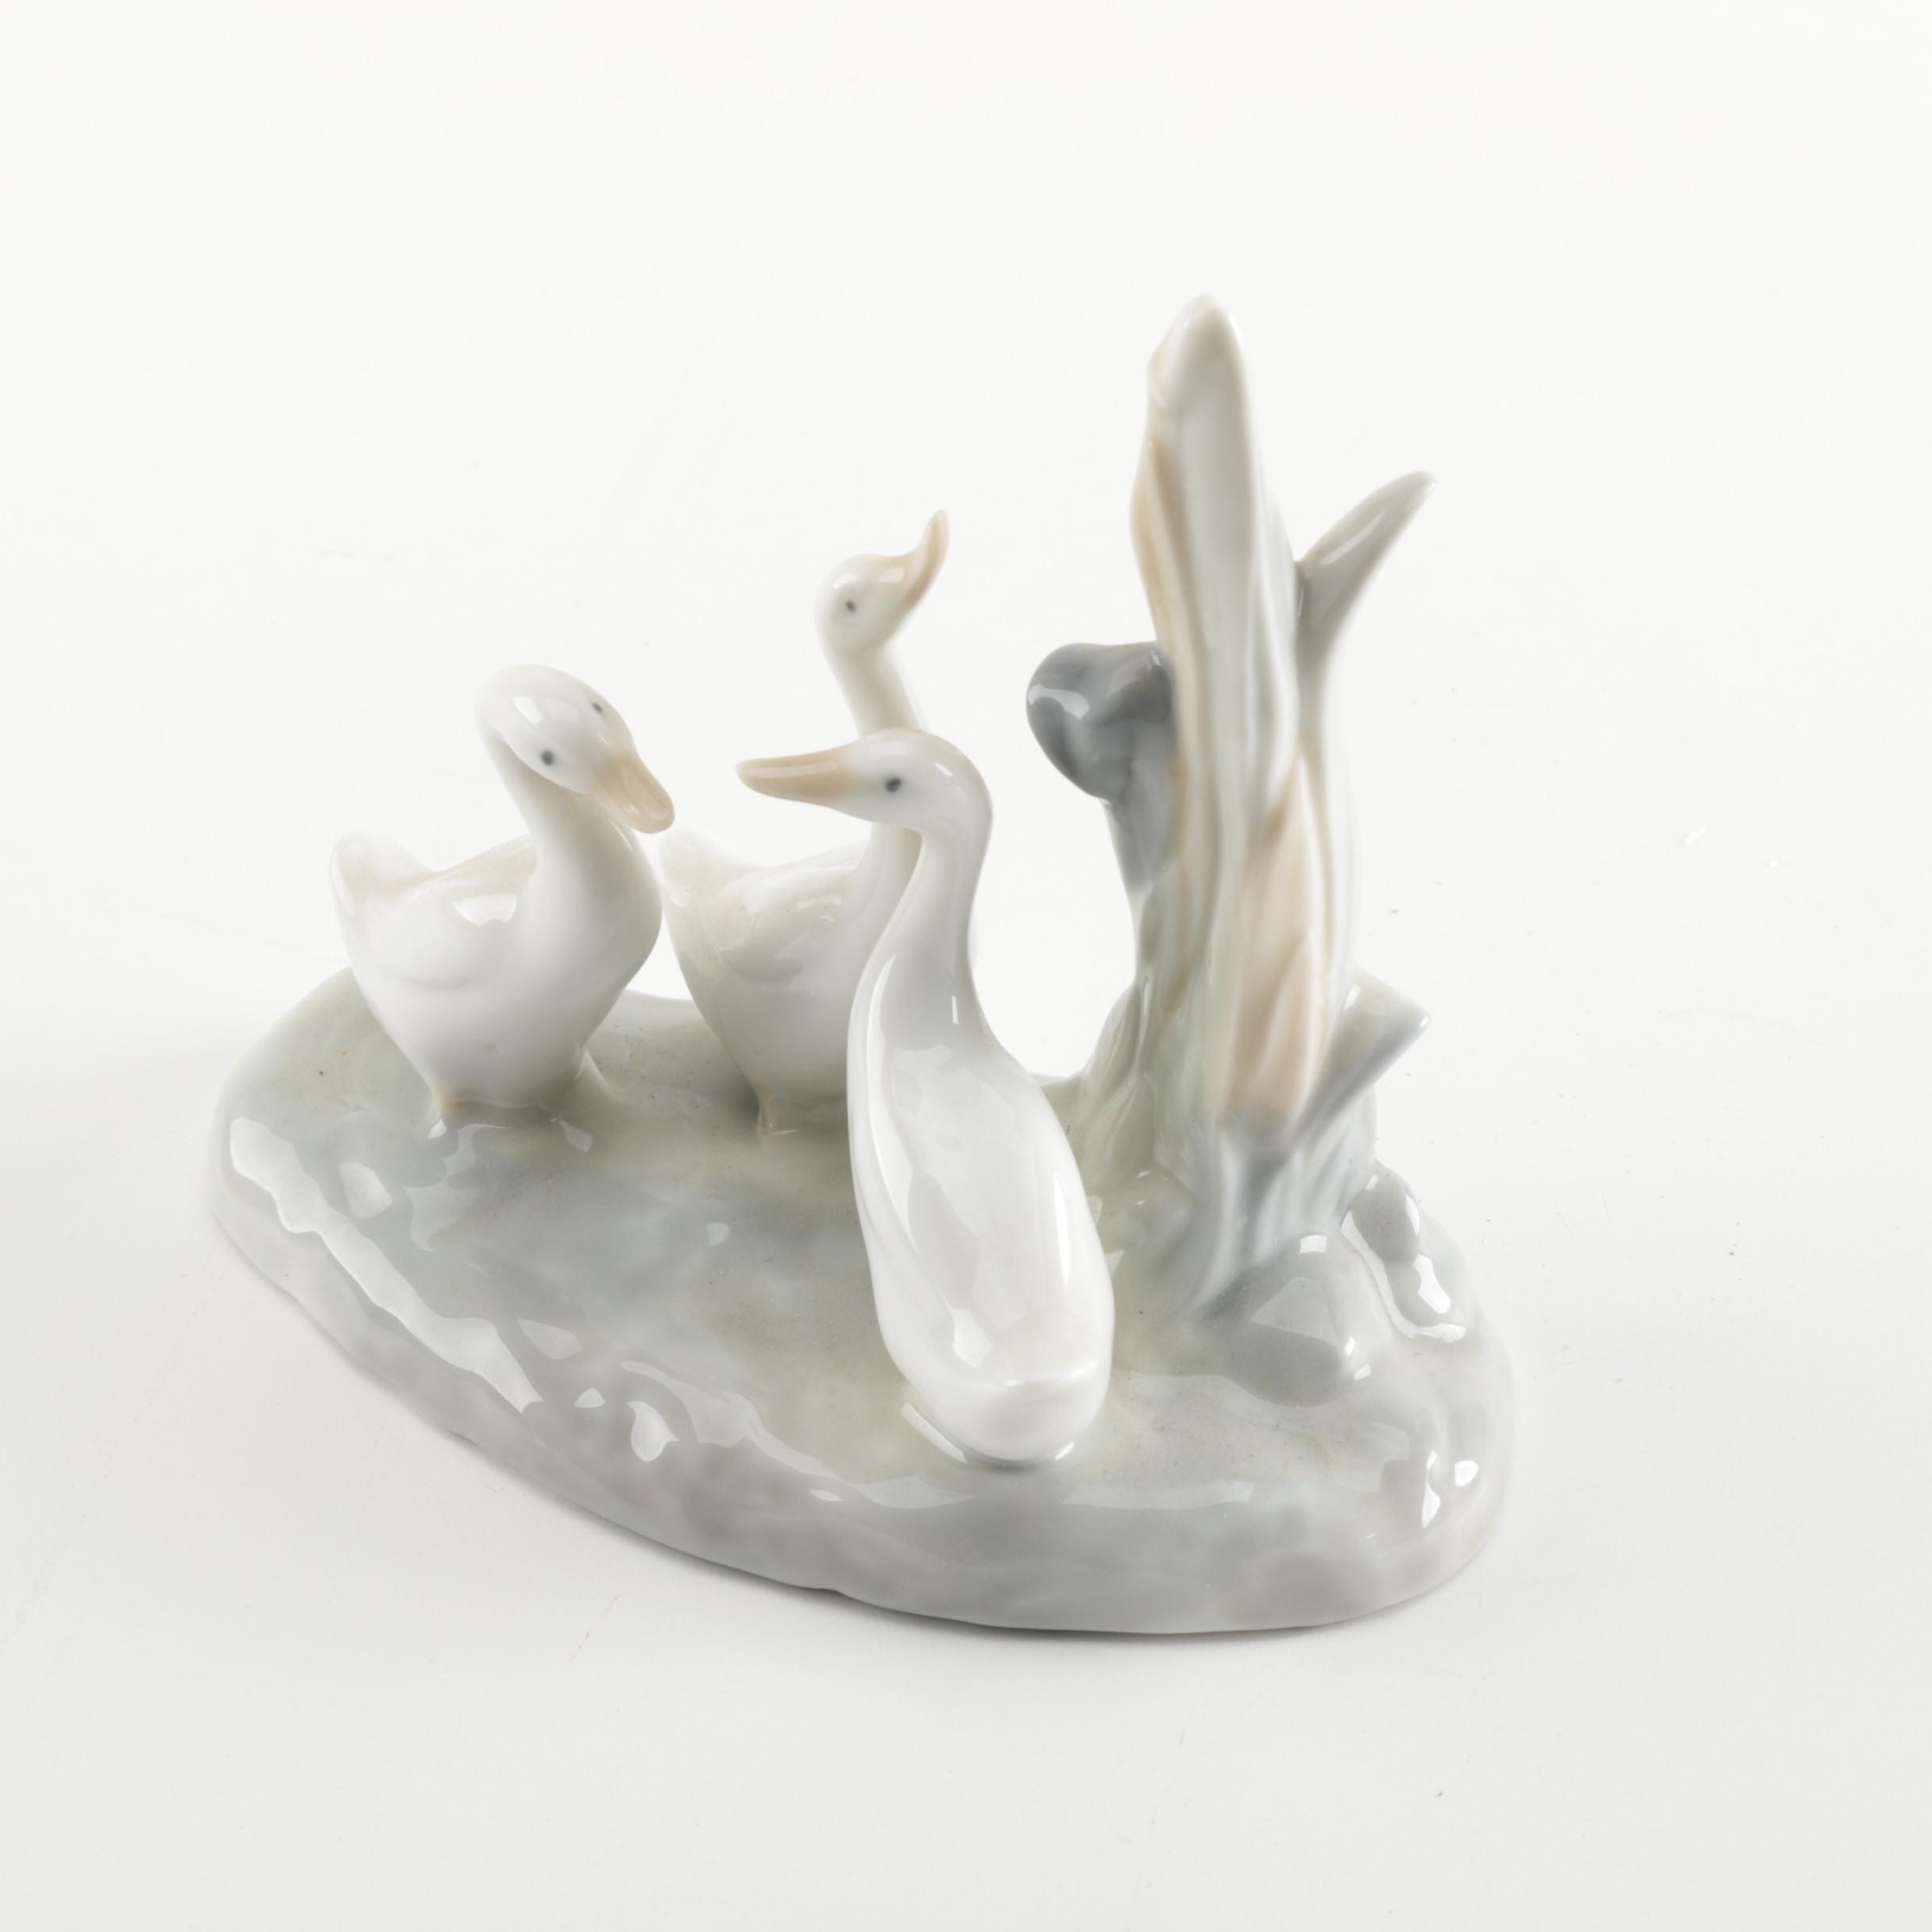 Lladró Nao Porcelain Ducks Figurine